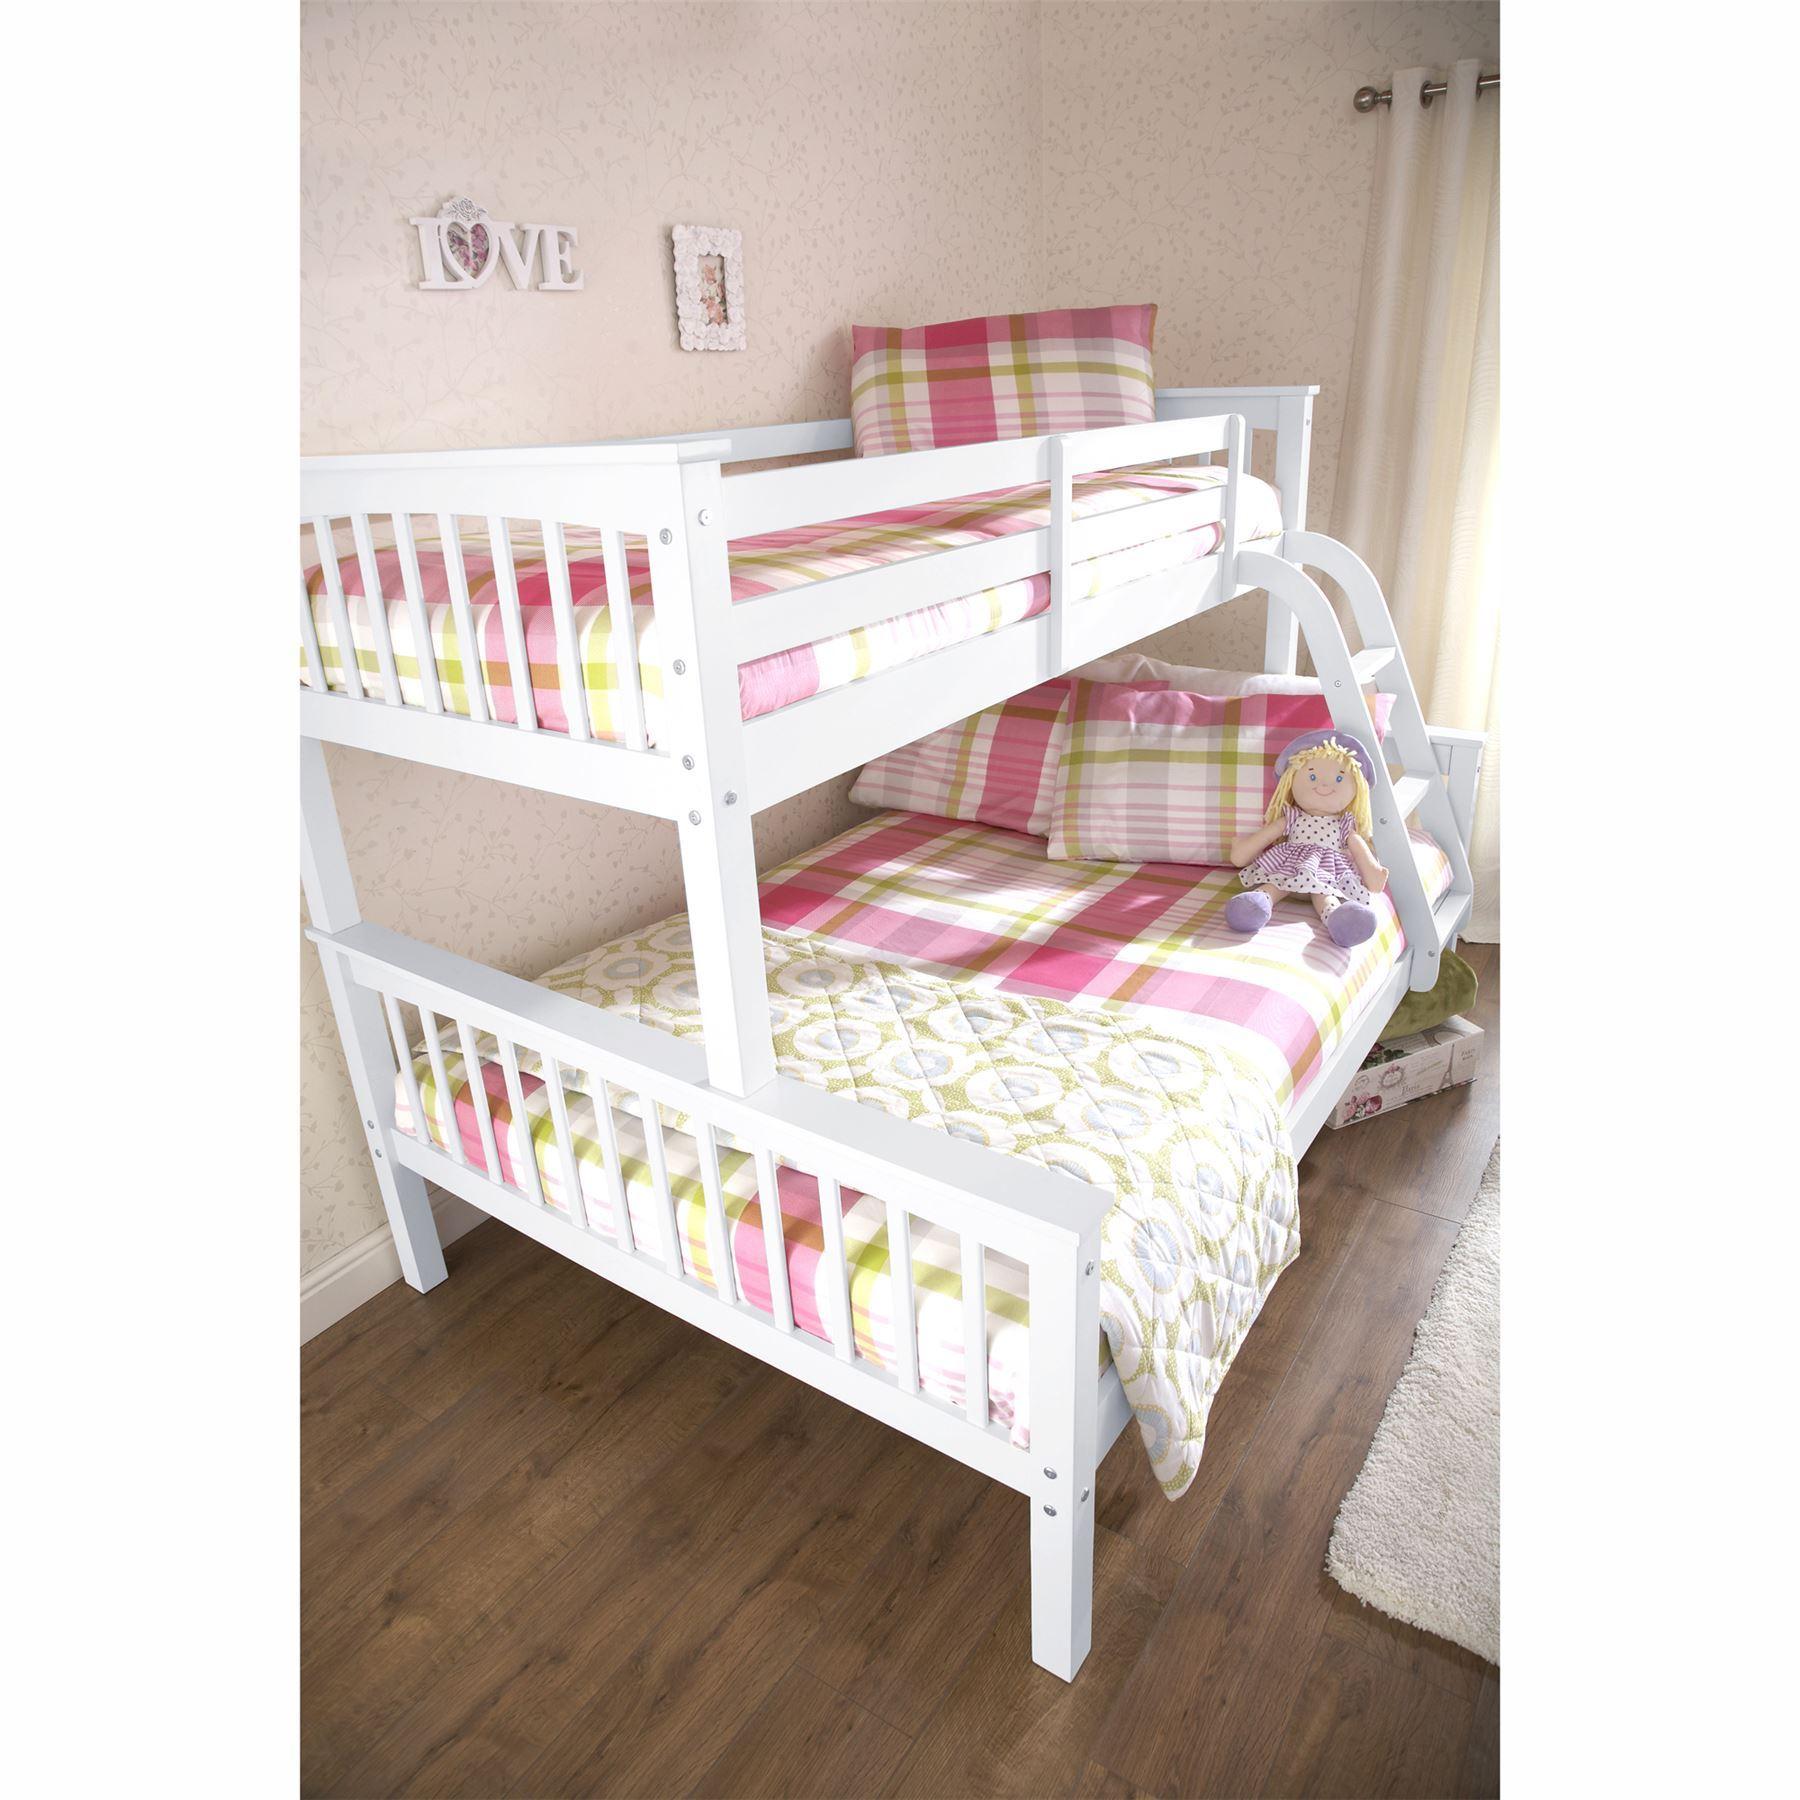 novaro trio white bunk bed frames 3ft single 4ft6 double. Black Bedroom Furniture Sets. Home Design Ideas